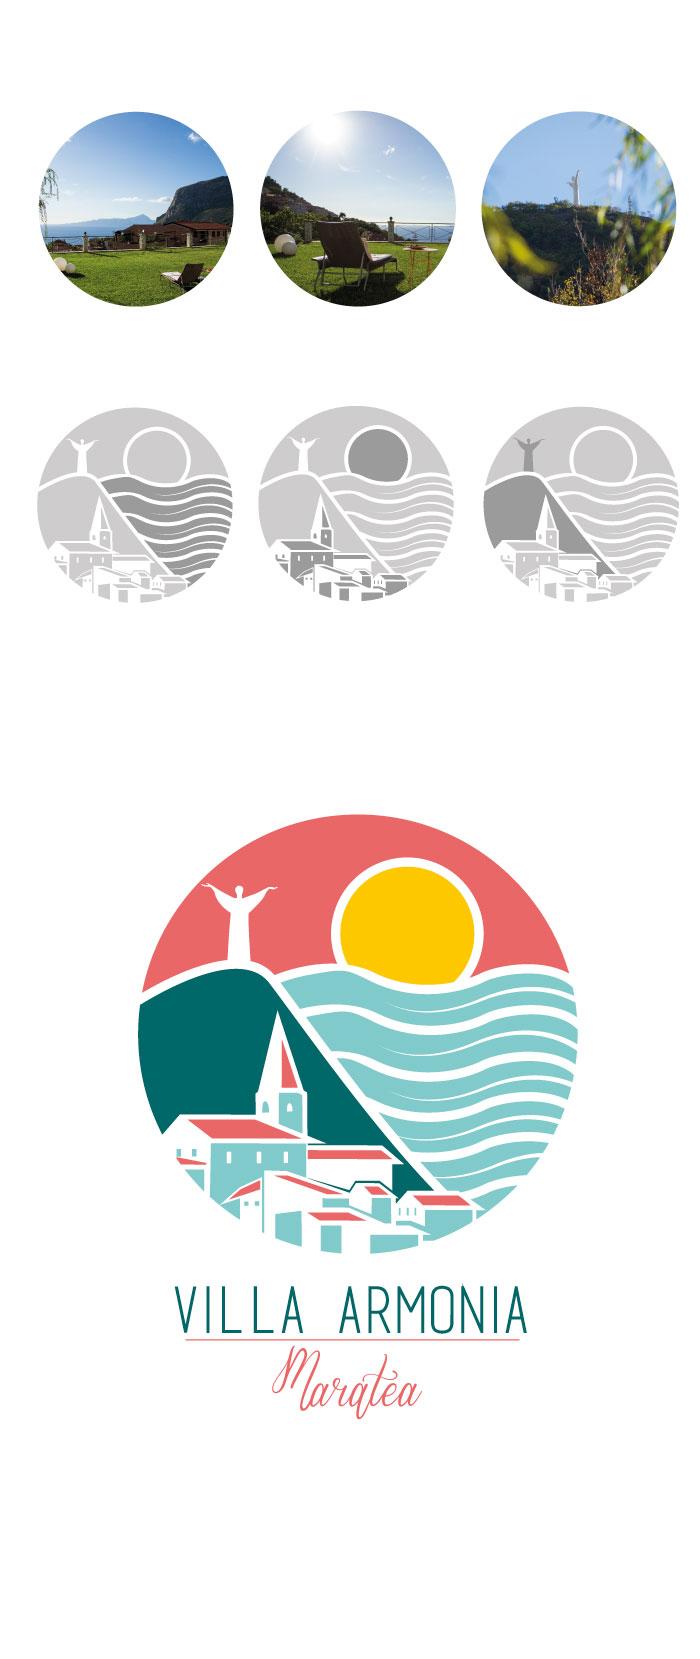 villa armonia, maratea, bed and breackfast, logo, graphic Design, diana petrarca